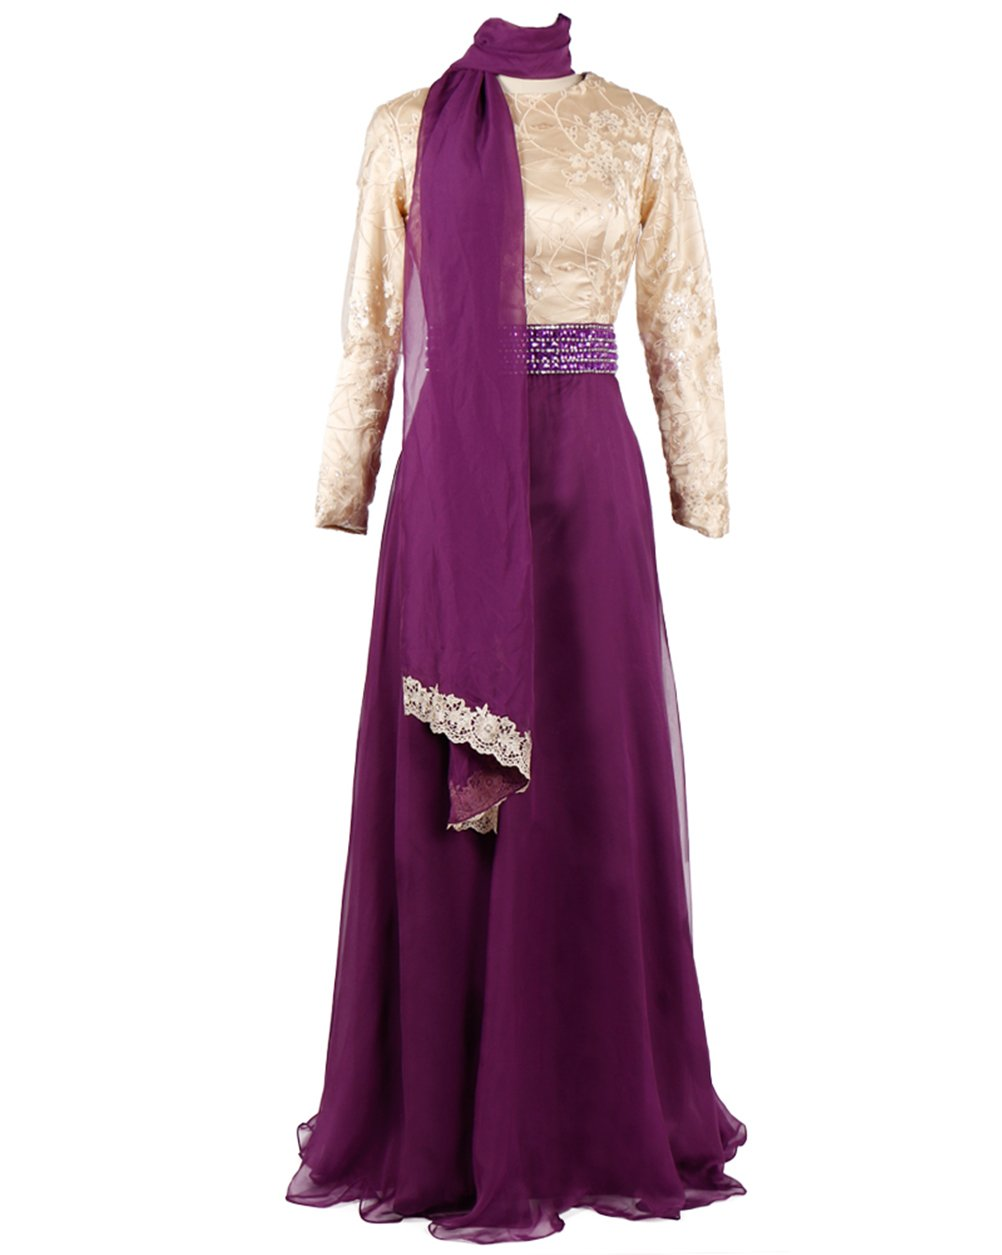 Oyeahbridal Muslim Women Dress Hijab Kaftan Bow Evening Prom Formal Gown Purple US size 14